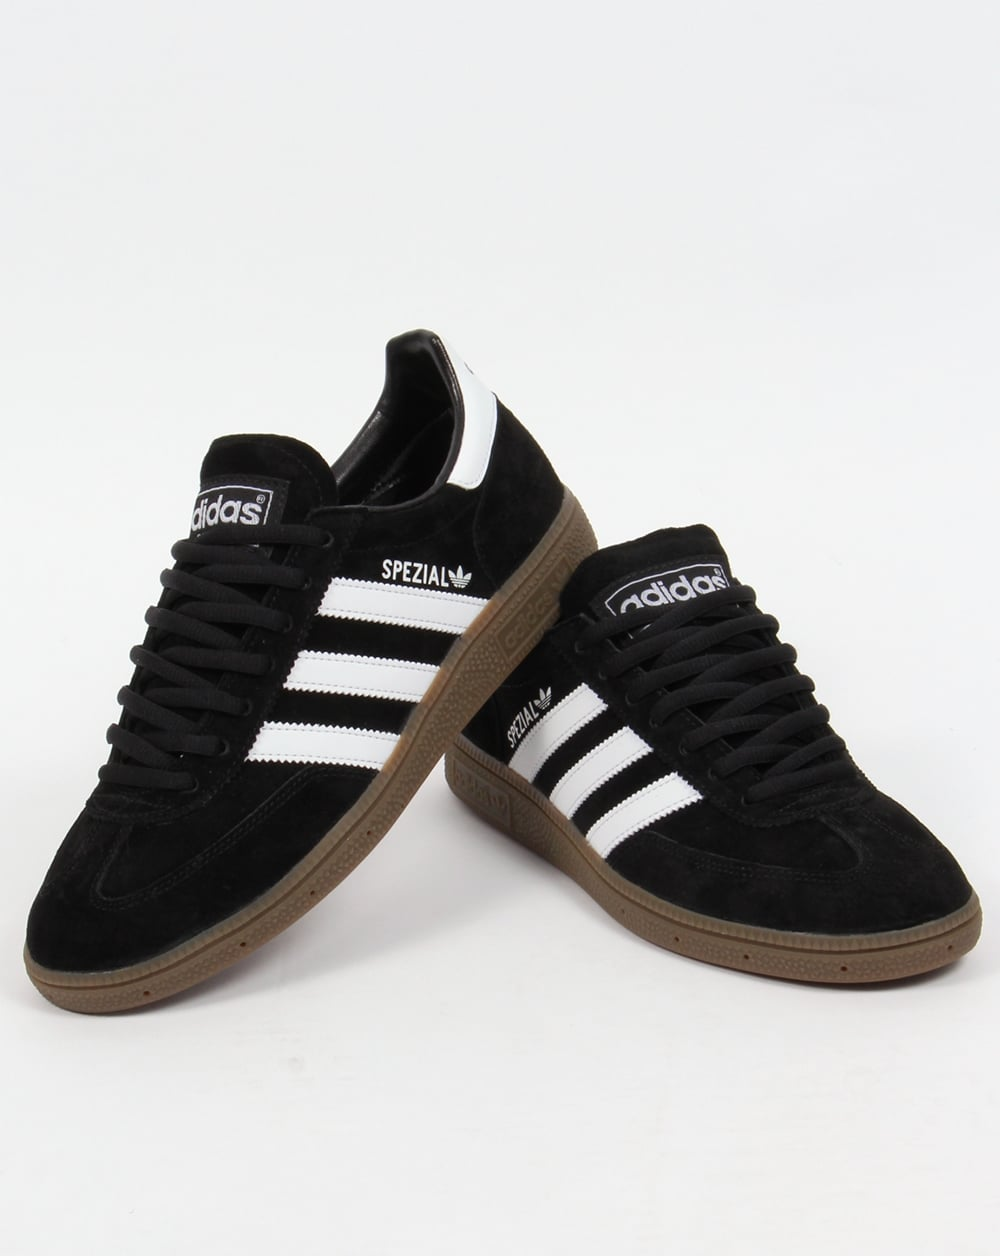 Berghaus Supalite Ii Gtx Mens Walking Boots Chocolate 484427-4-21604cp1